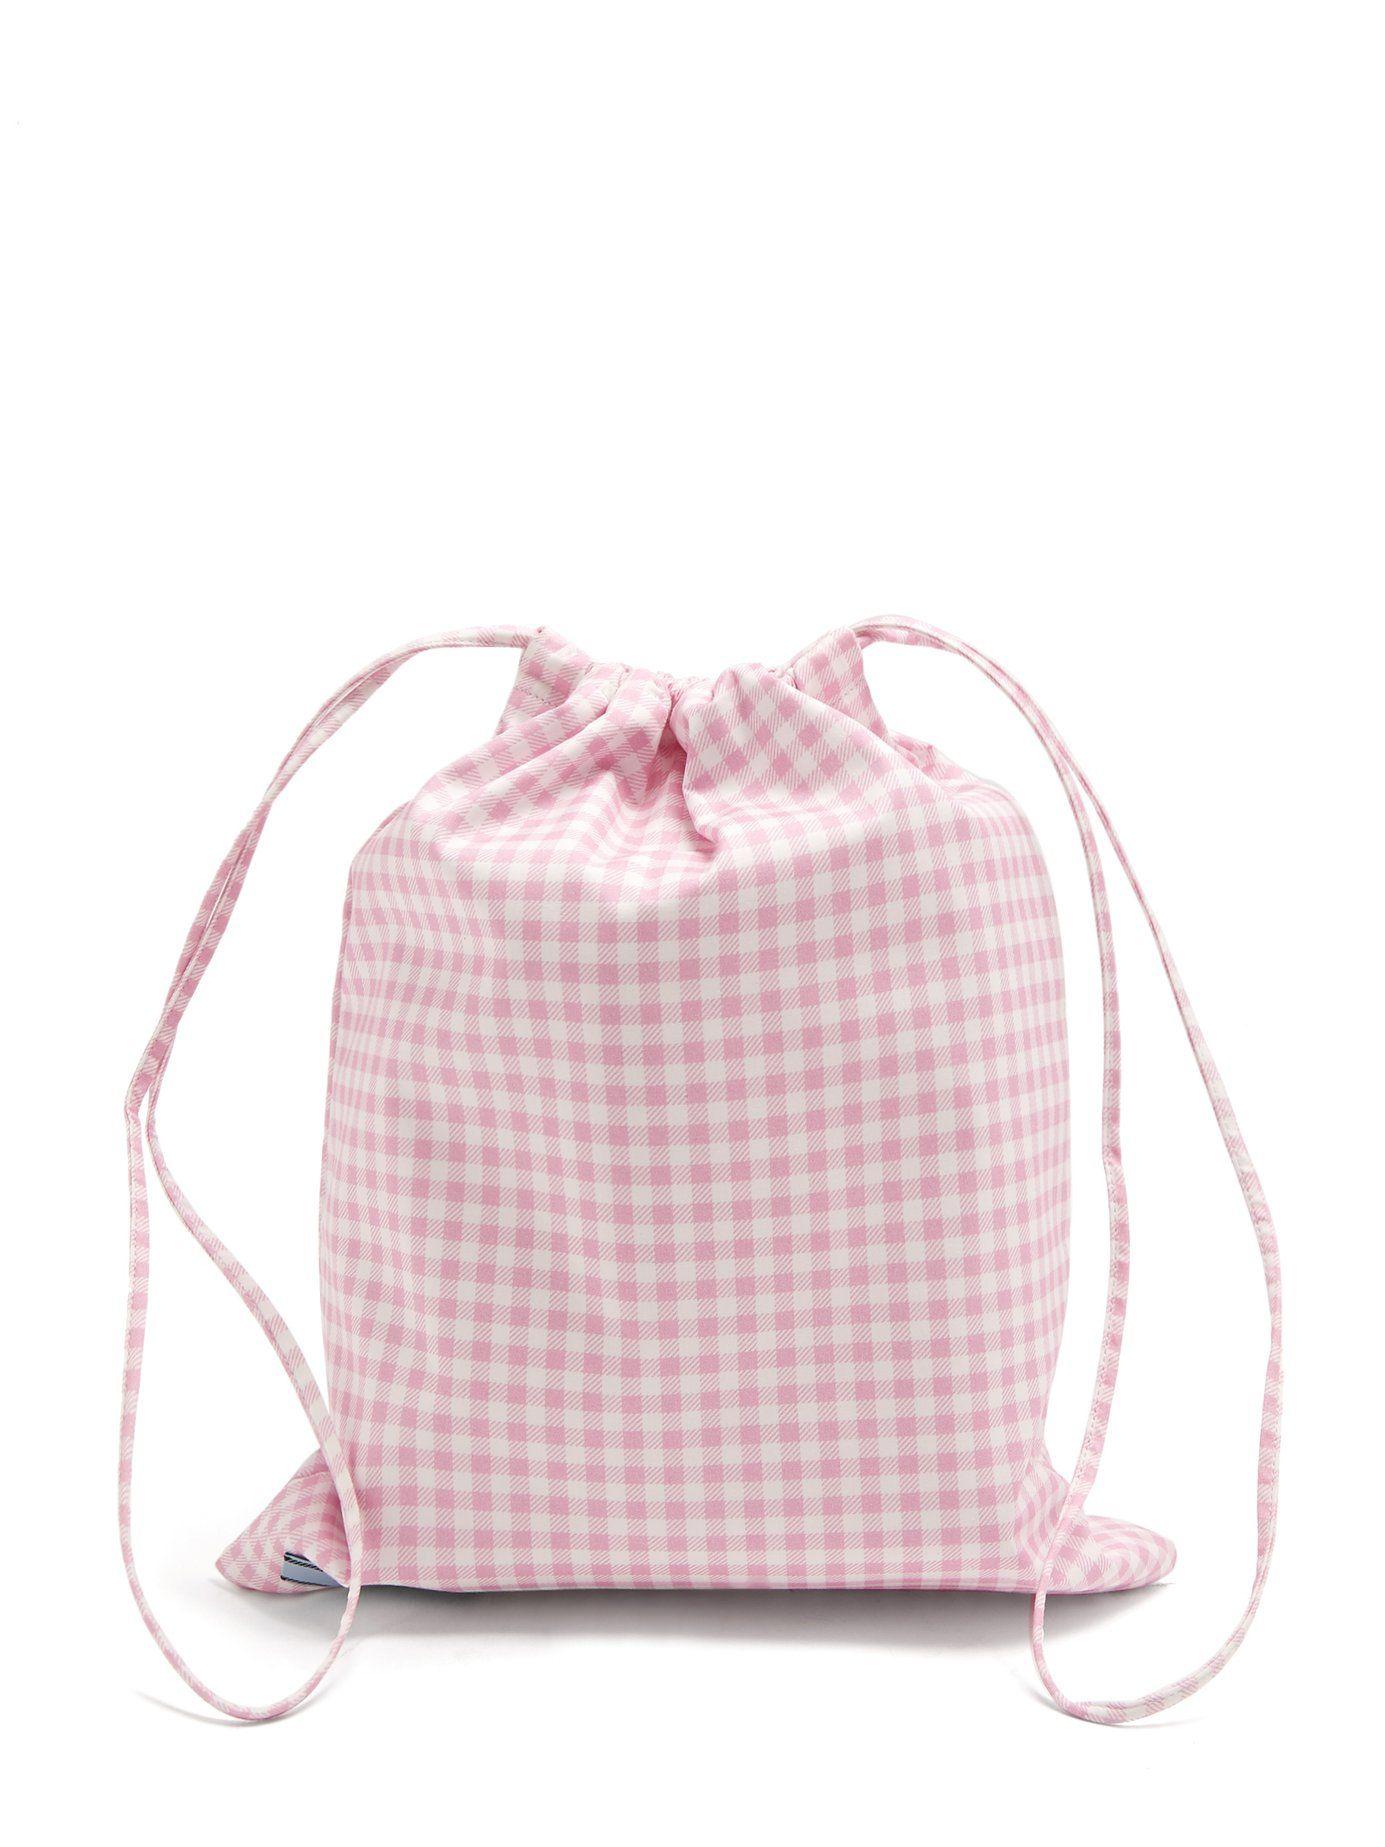 e36d61806f3 Click here to buy Prada Gingham drawstring wash bag at MATCHESFASHION.COM